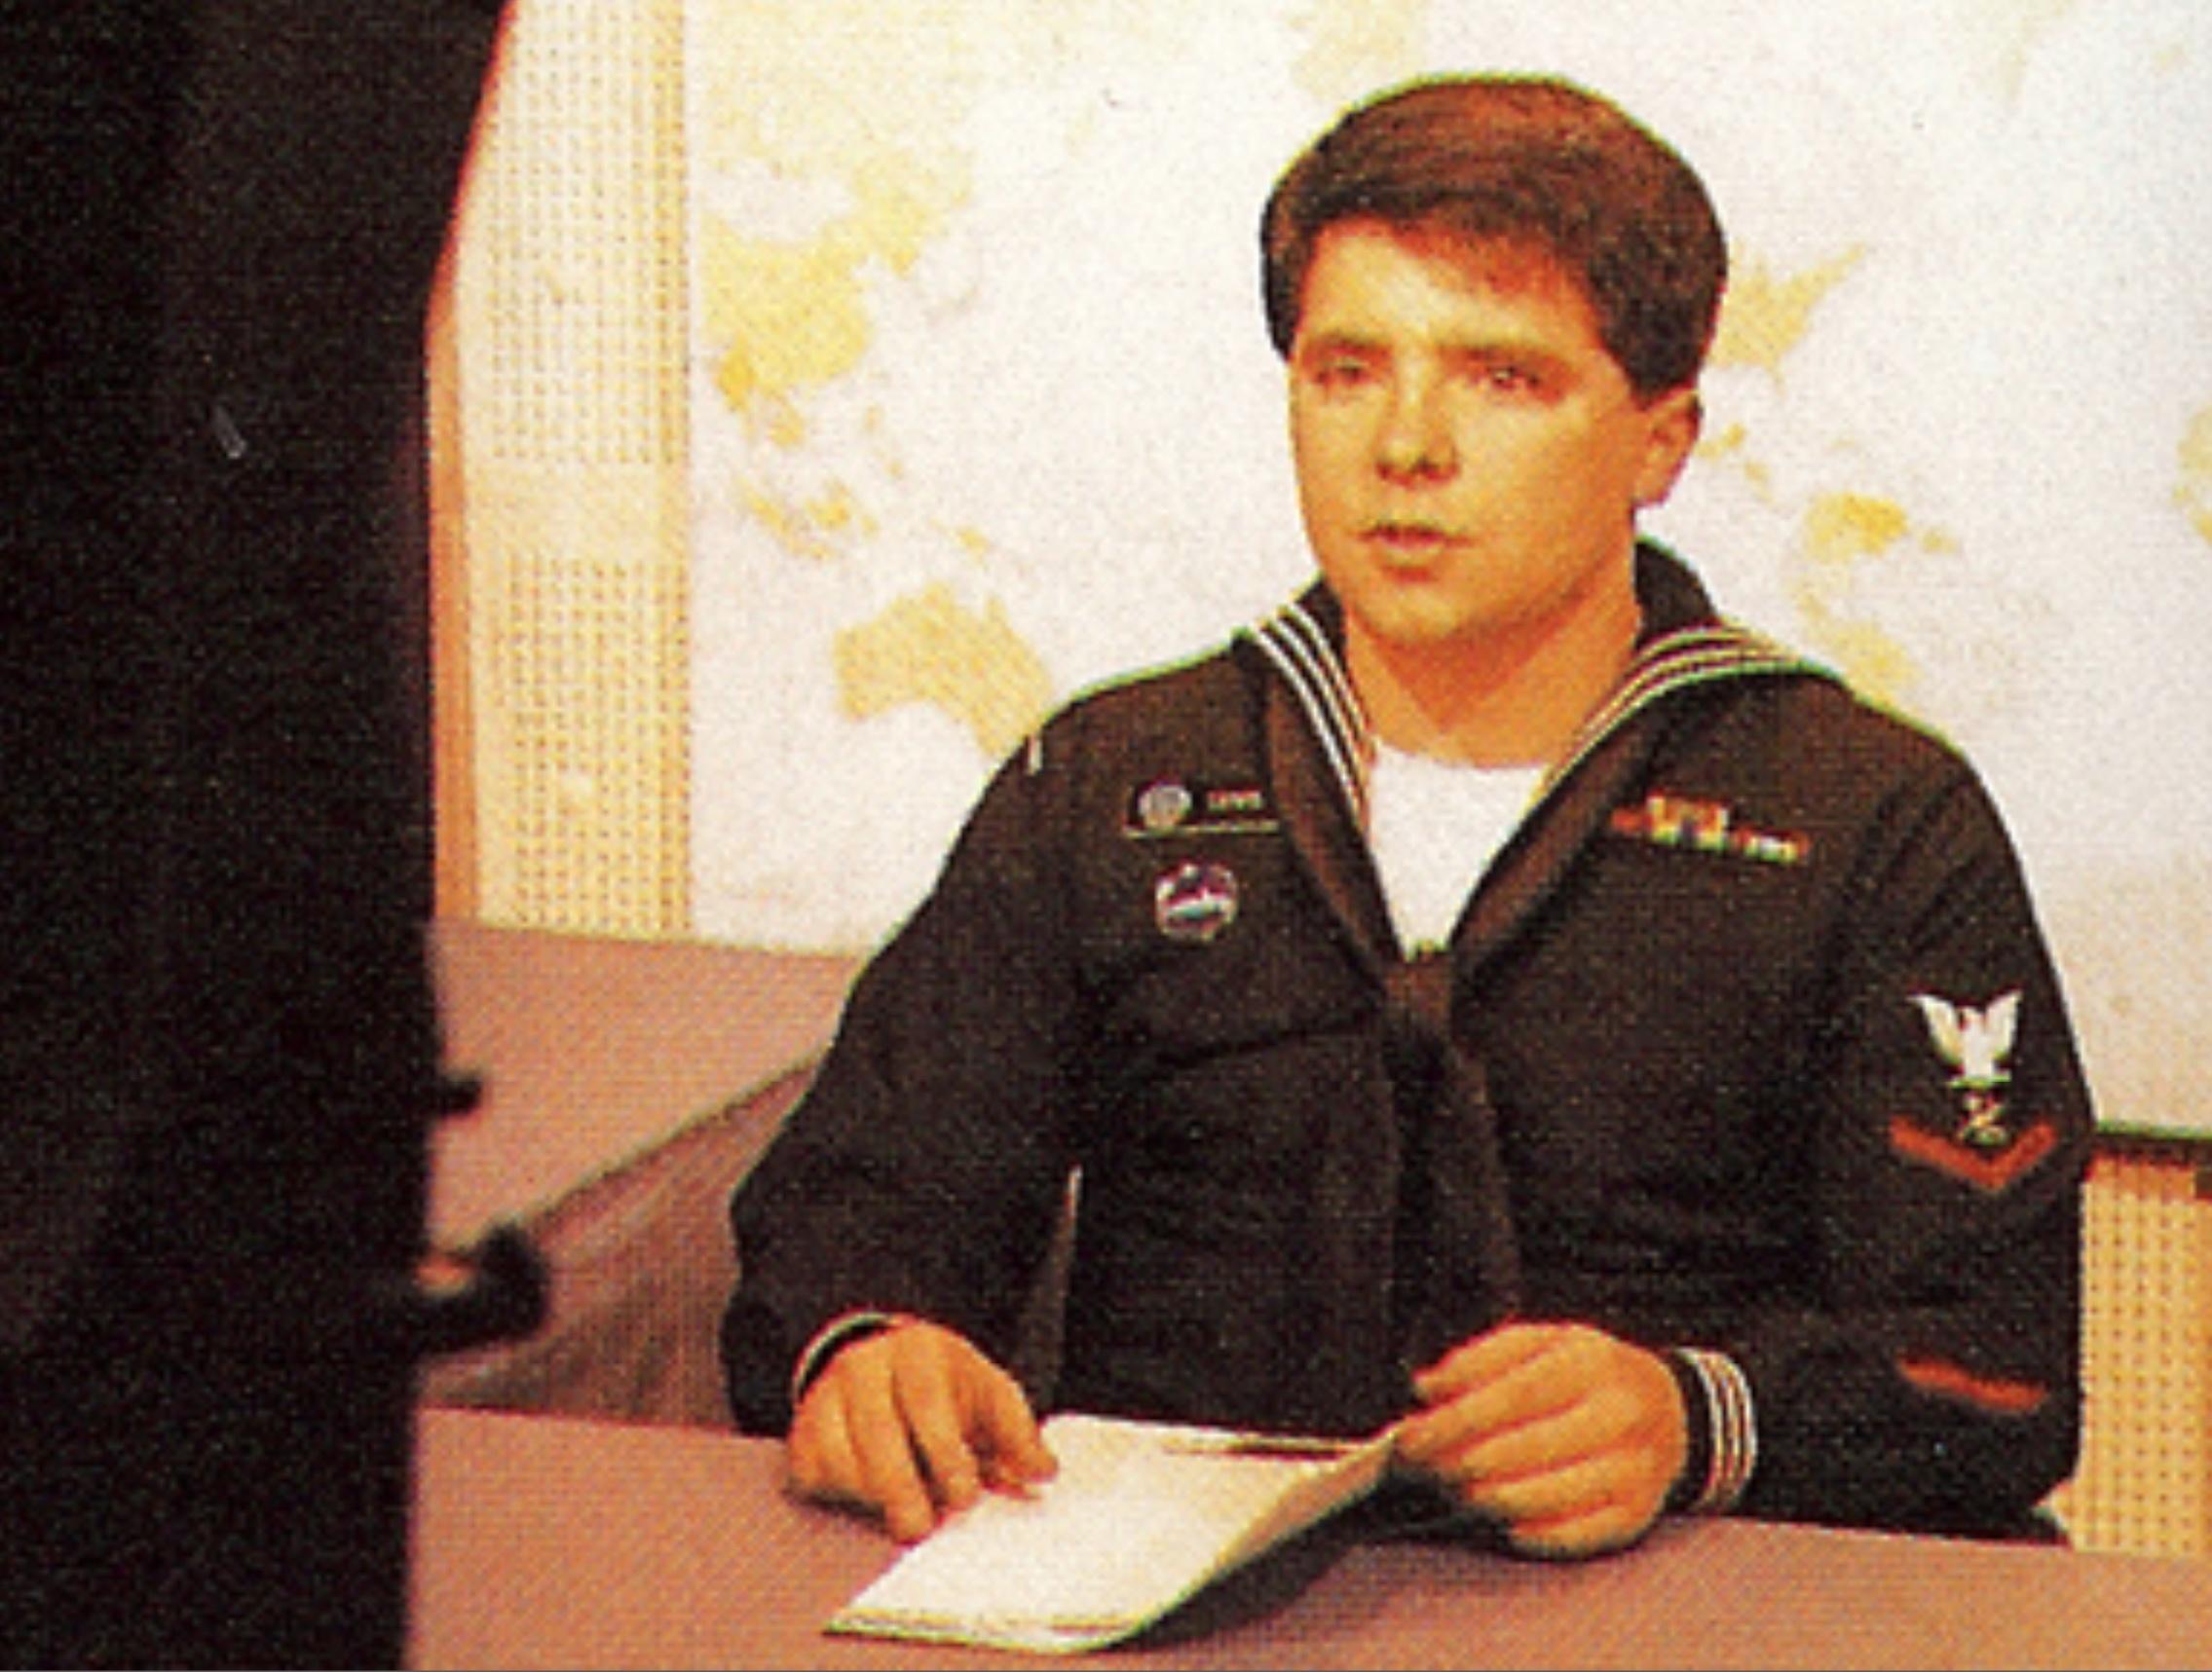 Tim Lewis at Navy News Desk